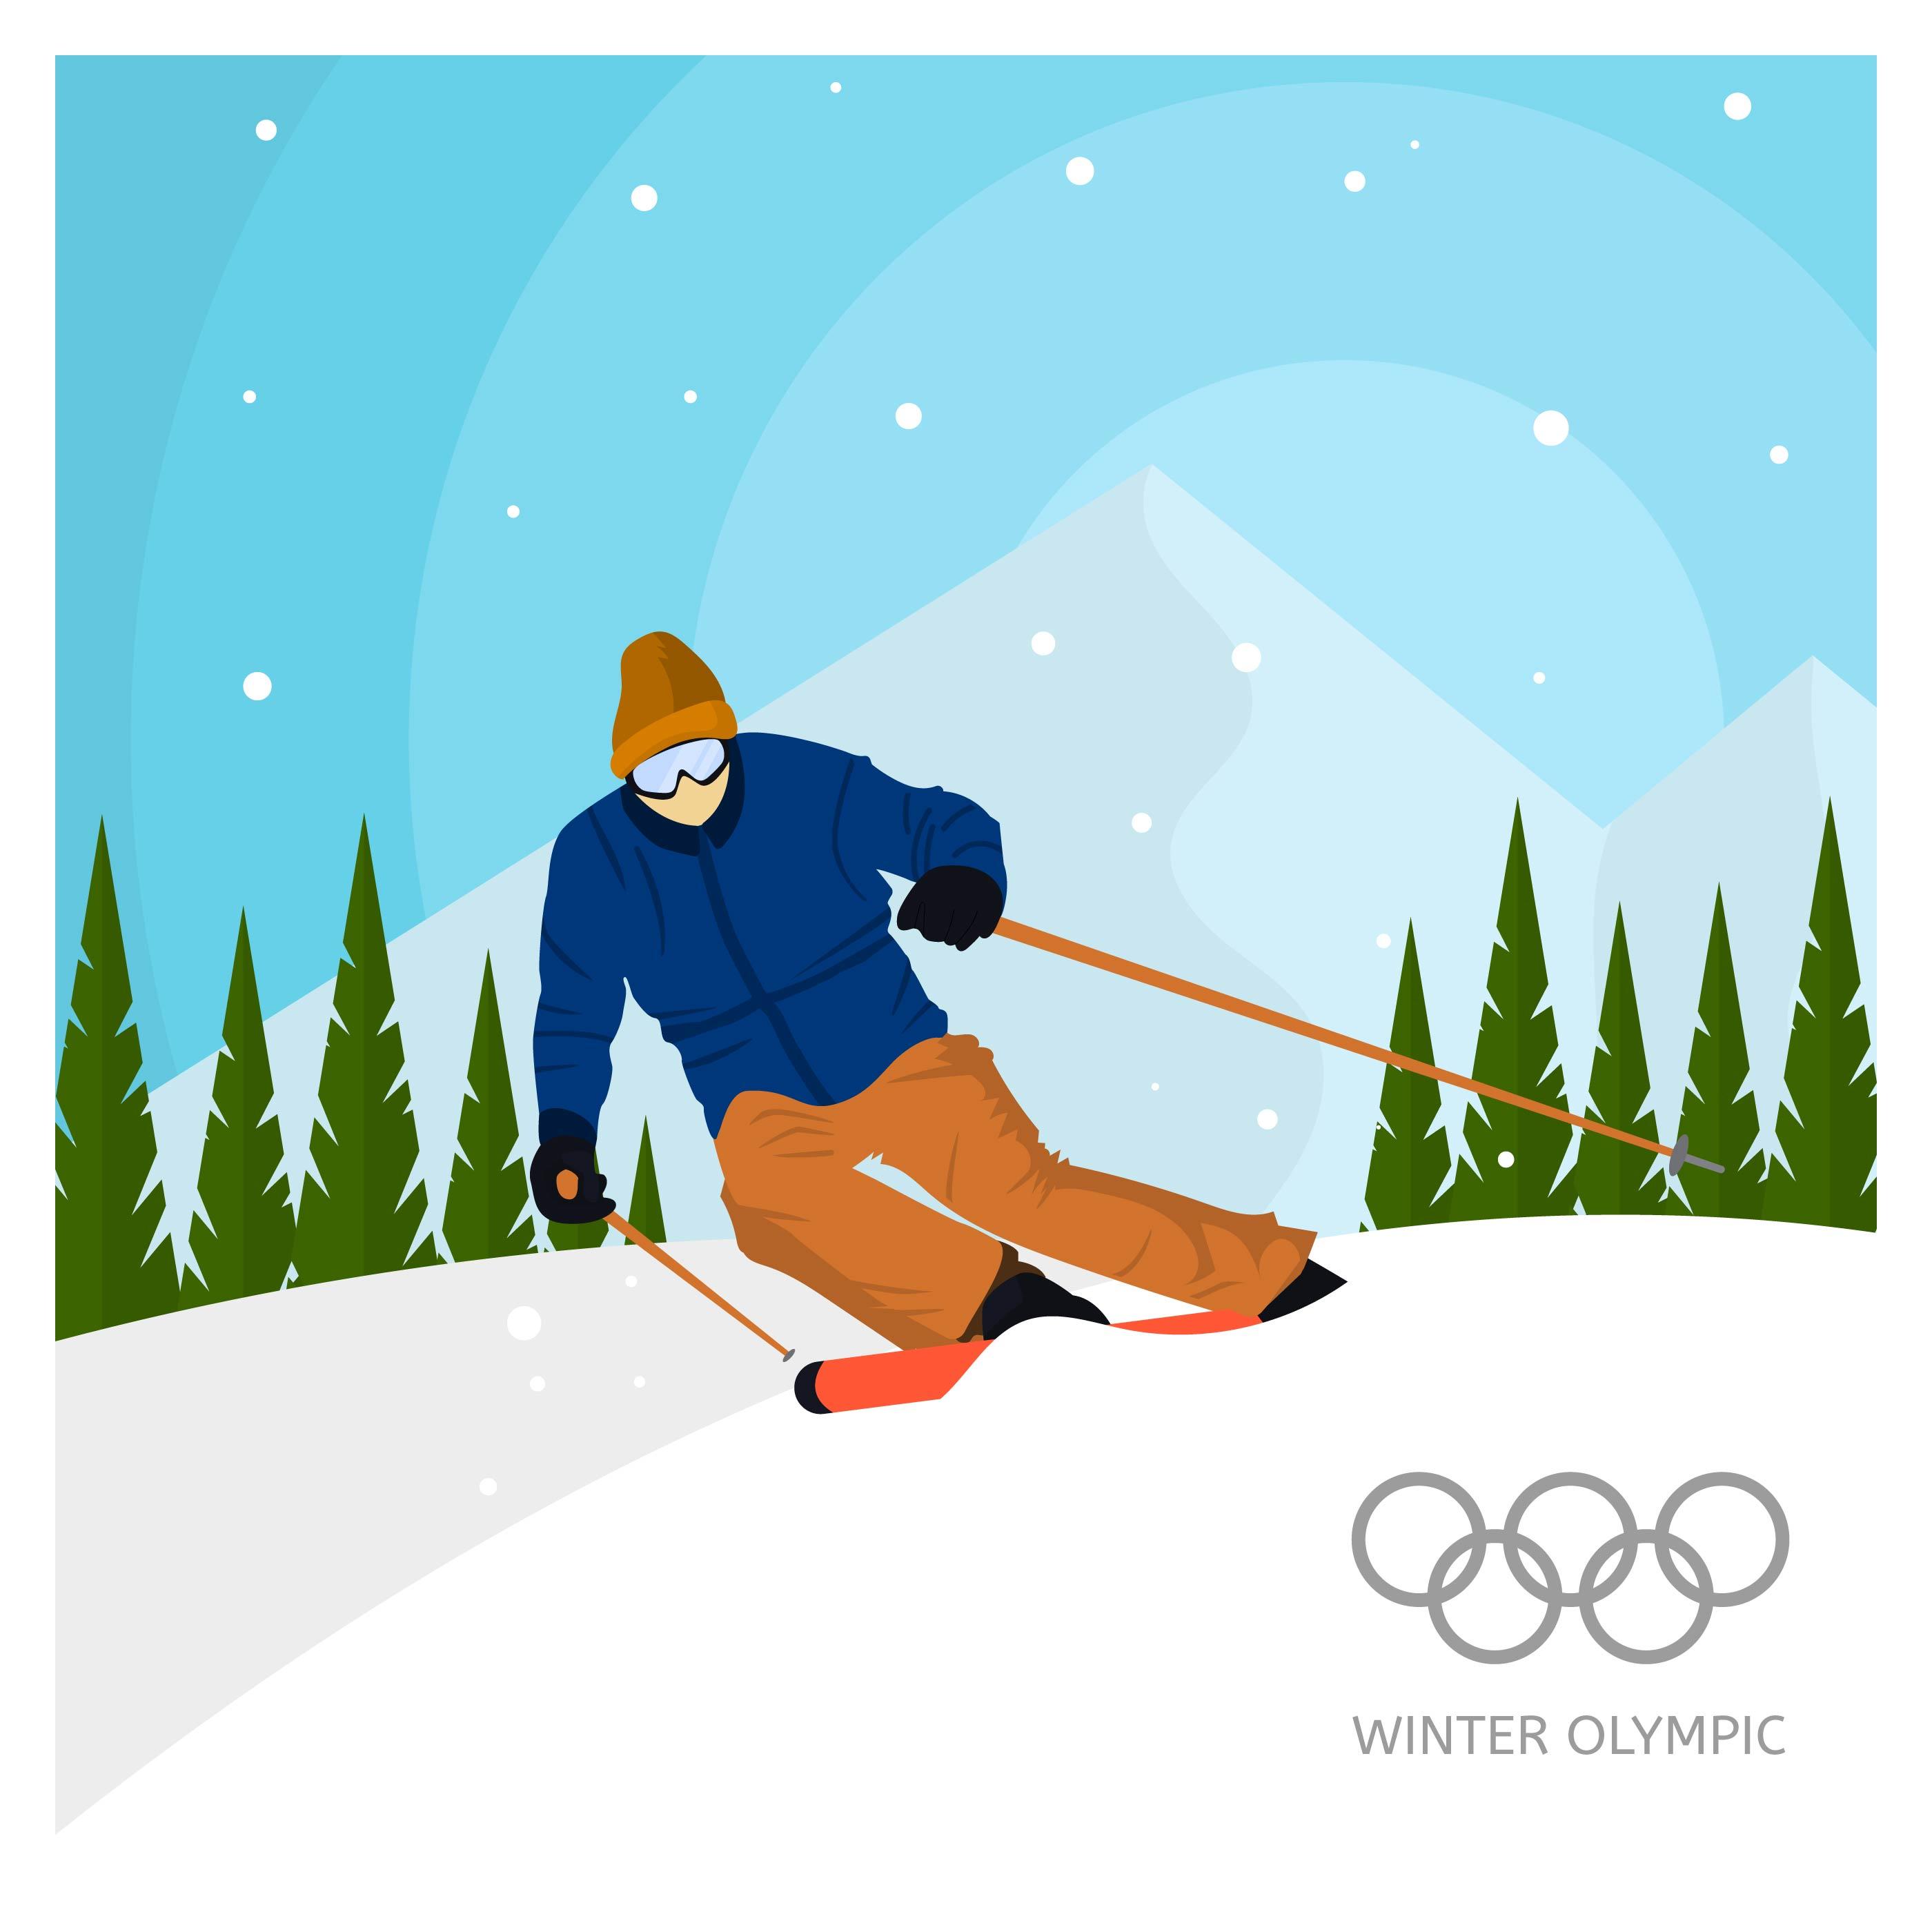 pursuit free vector art  41 free downloads winter olympics clip art winter olympics clip art for teachers